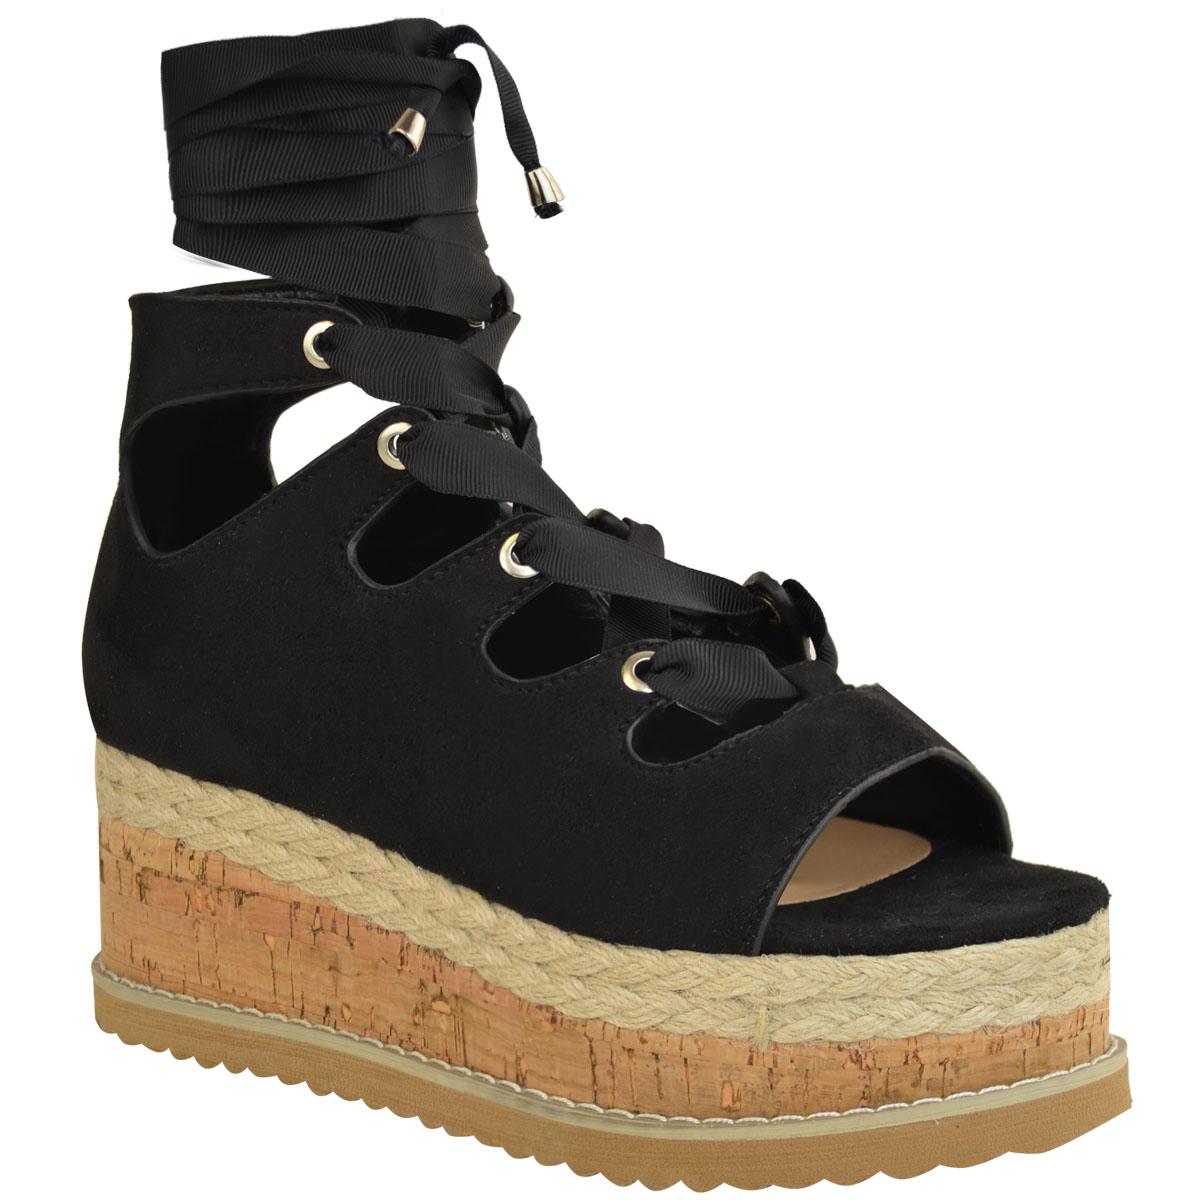 Womens-Ladies-Wedge-Flat-Espadrille-Lace-Tie-Up-Sandals-Platform-Summer-Shoes